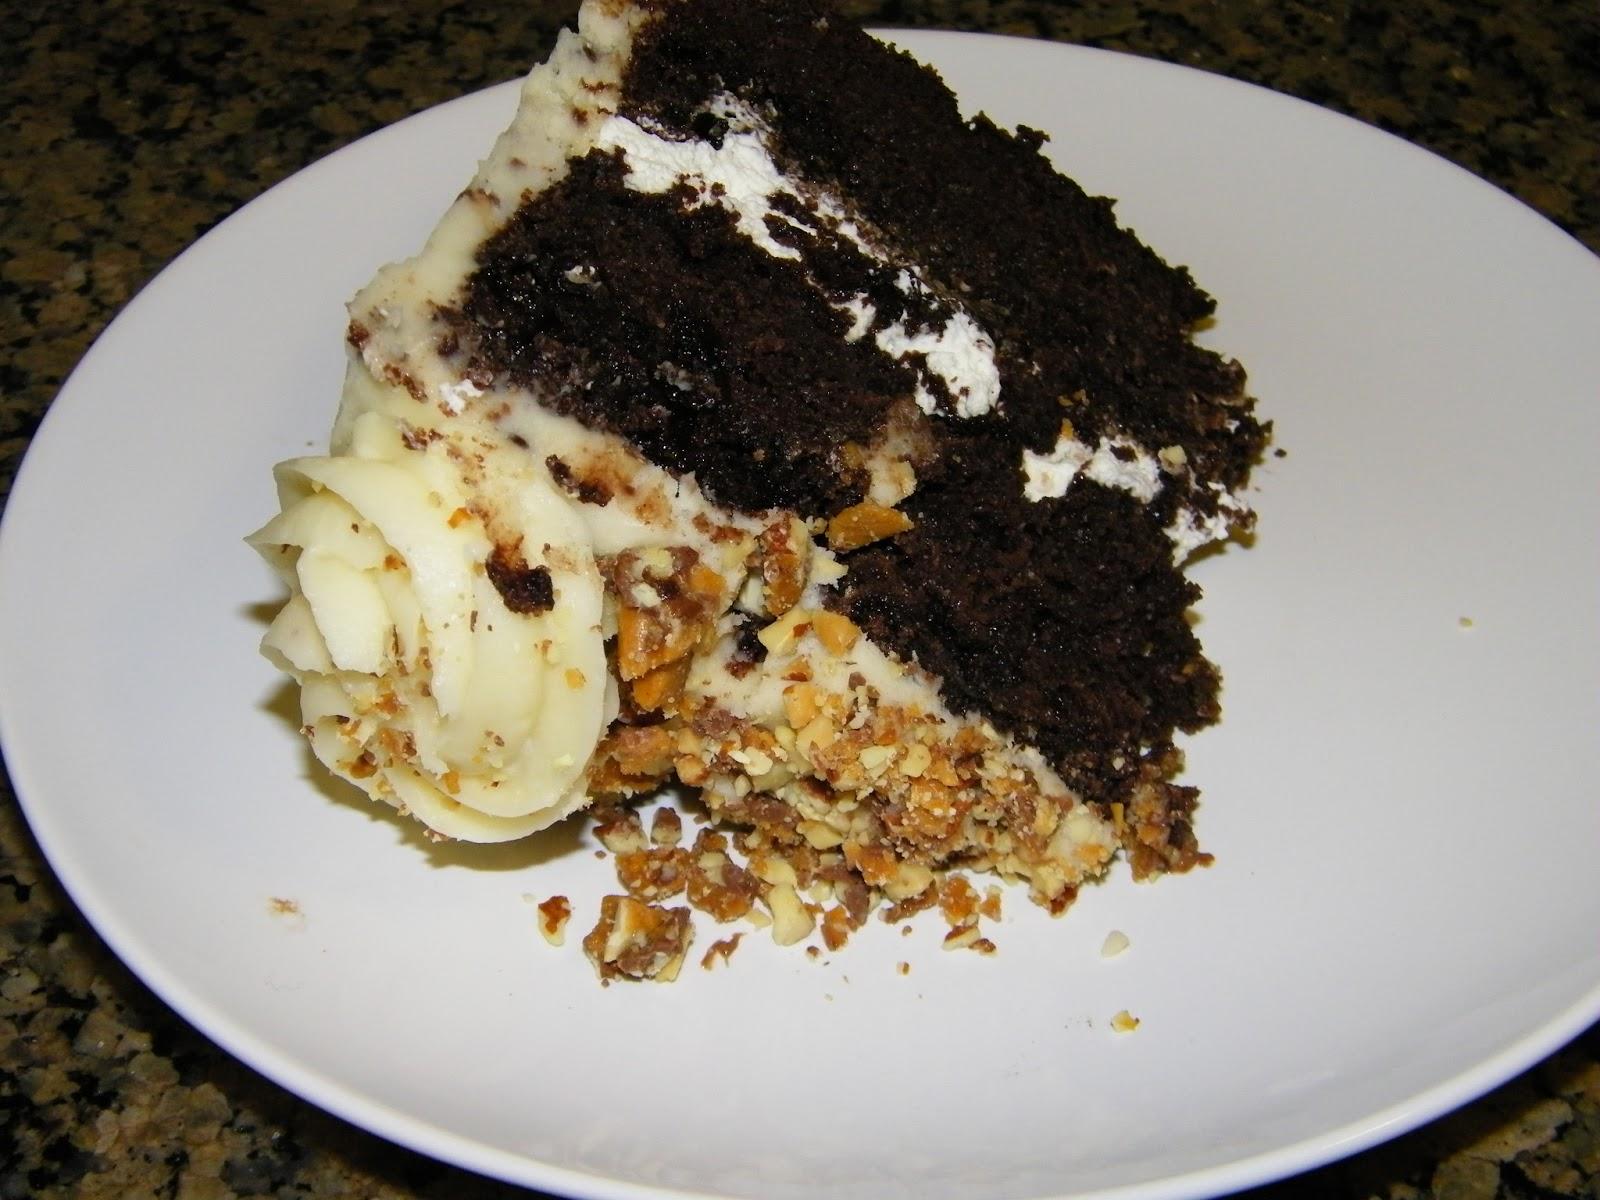 Cake Boss Vanilla Icing Recipe : Cake Recipe: Cake Boss Vanilla Frosting Recipe